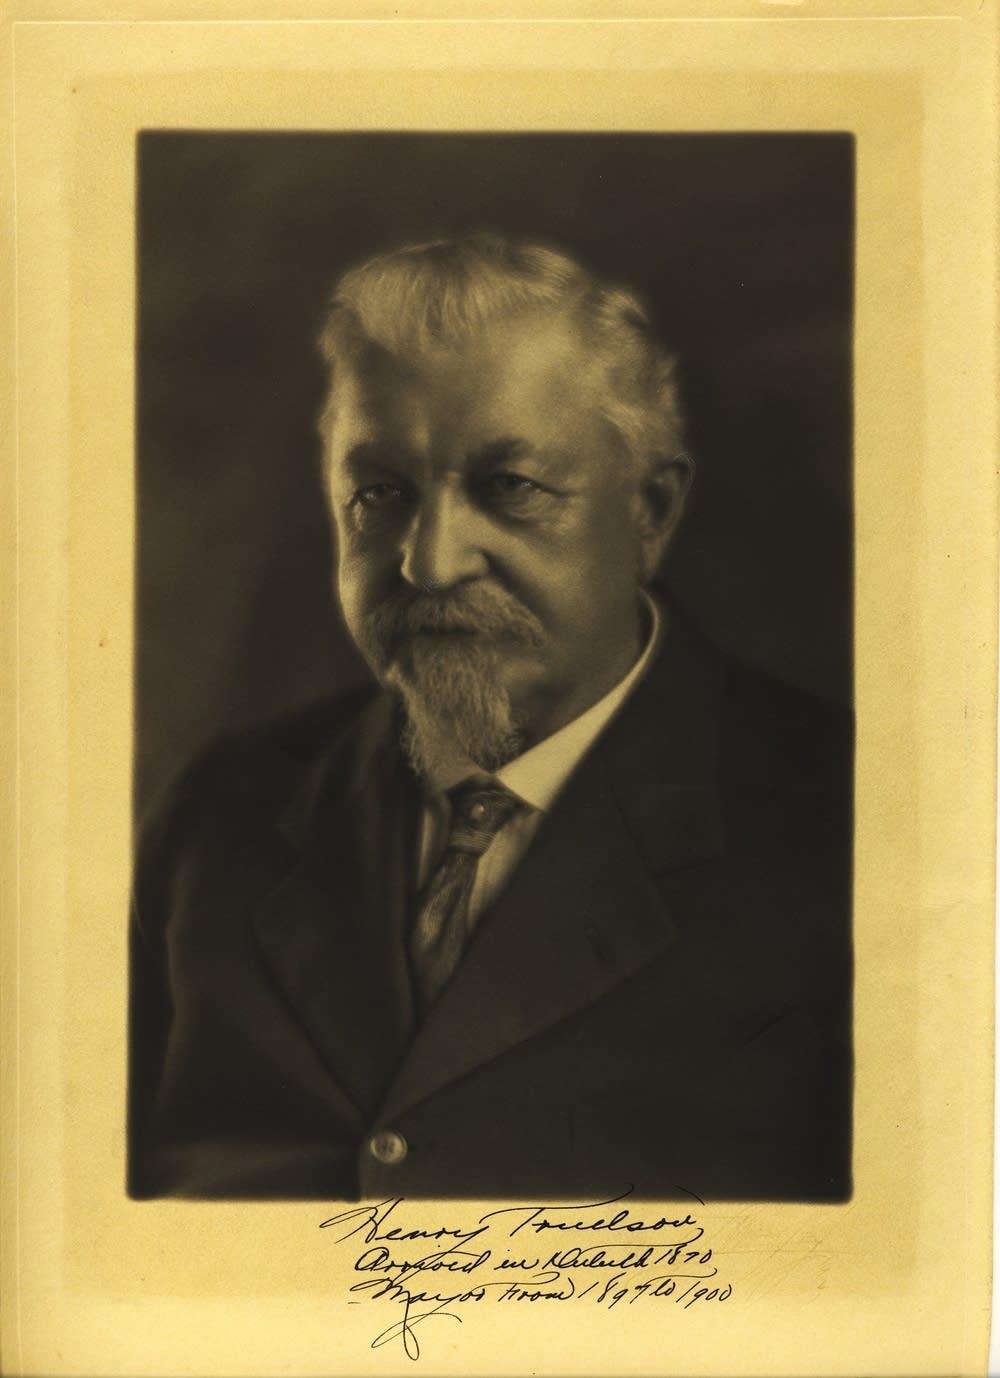 Henry Truelson